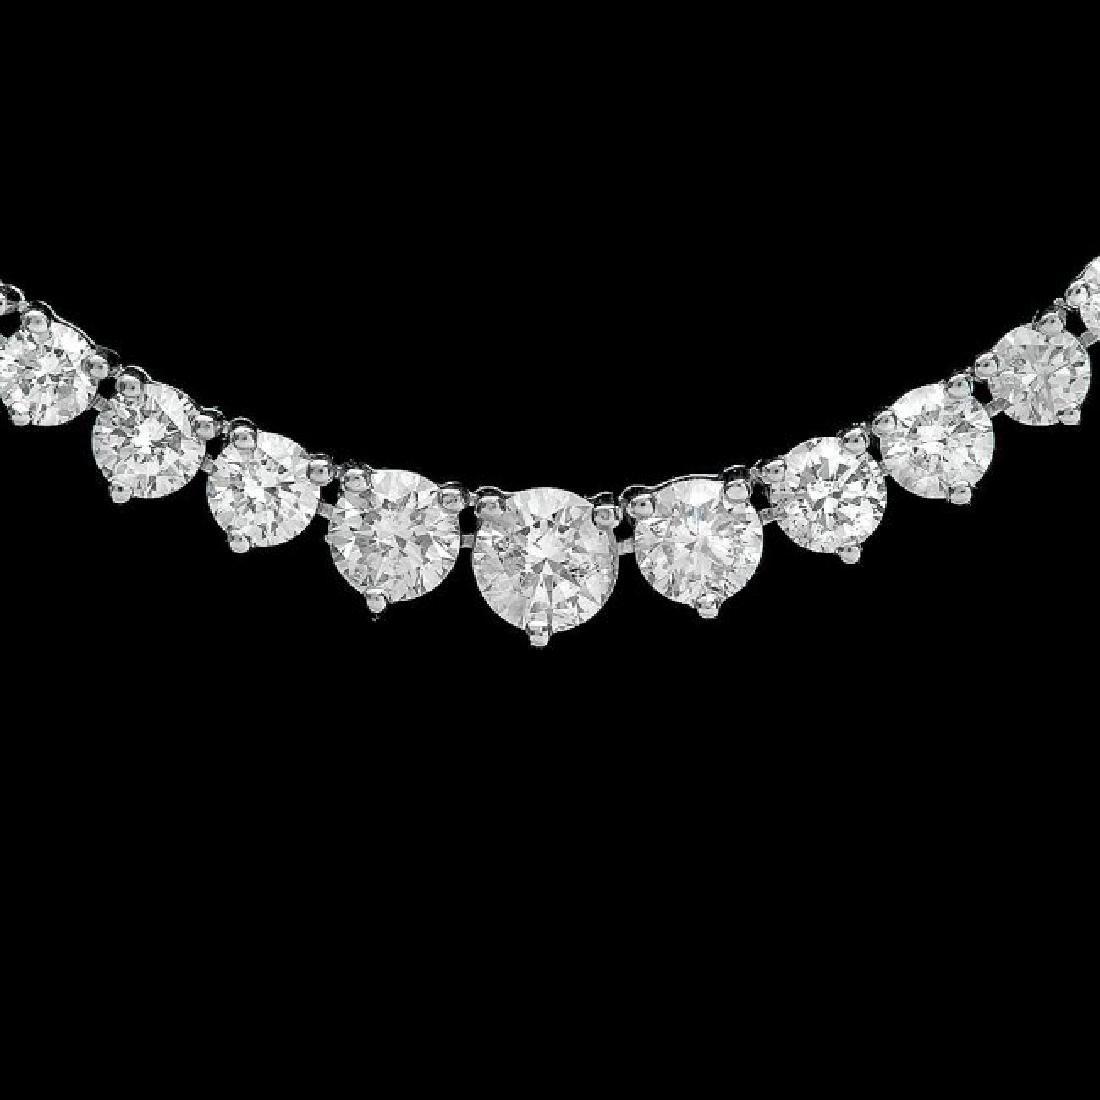 14k White Gold 9.30ct Diamond Necklace - 2